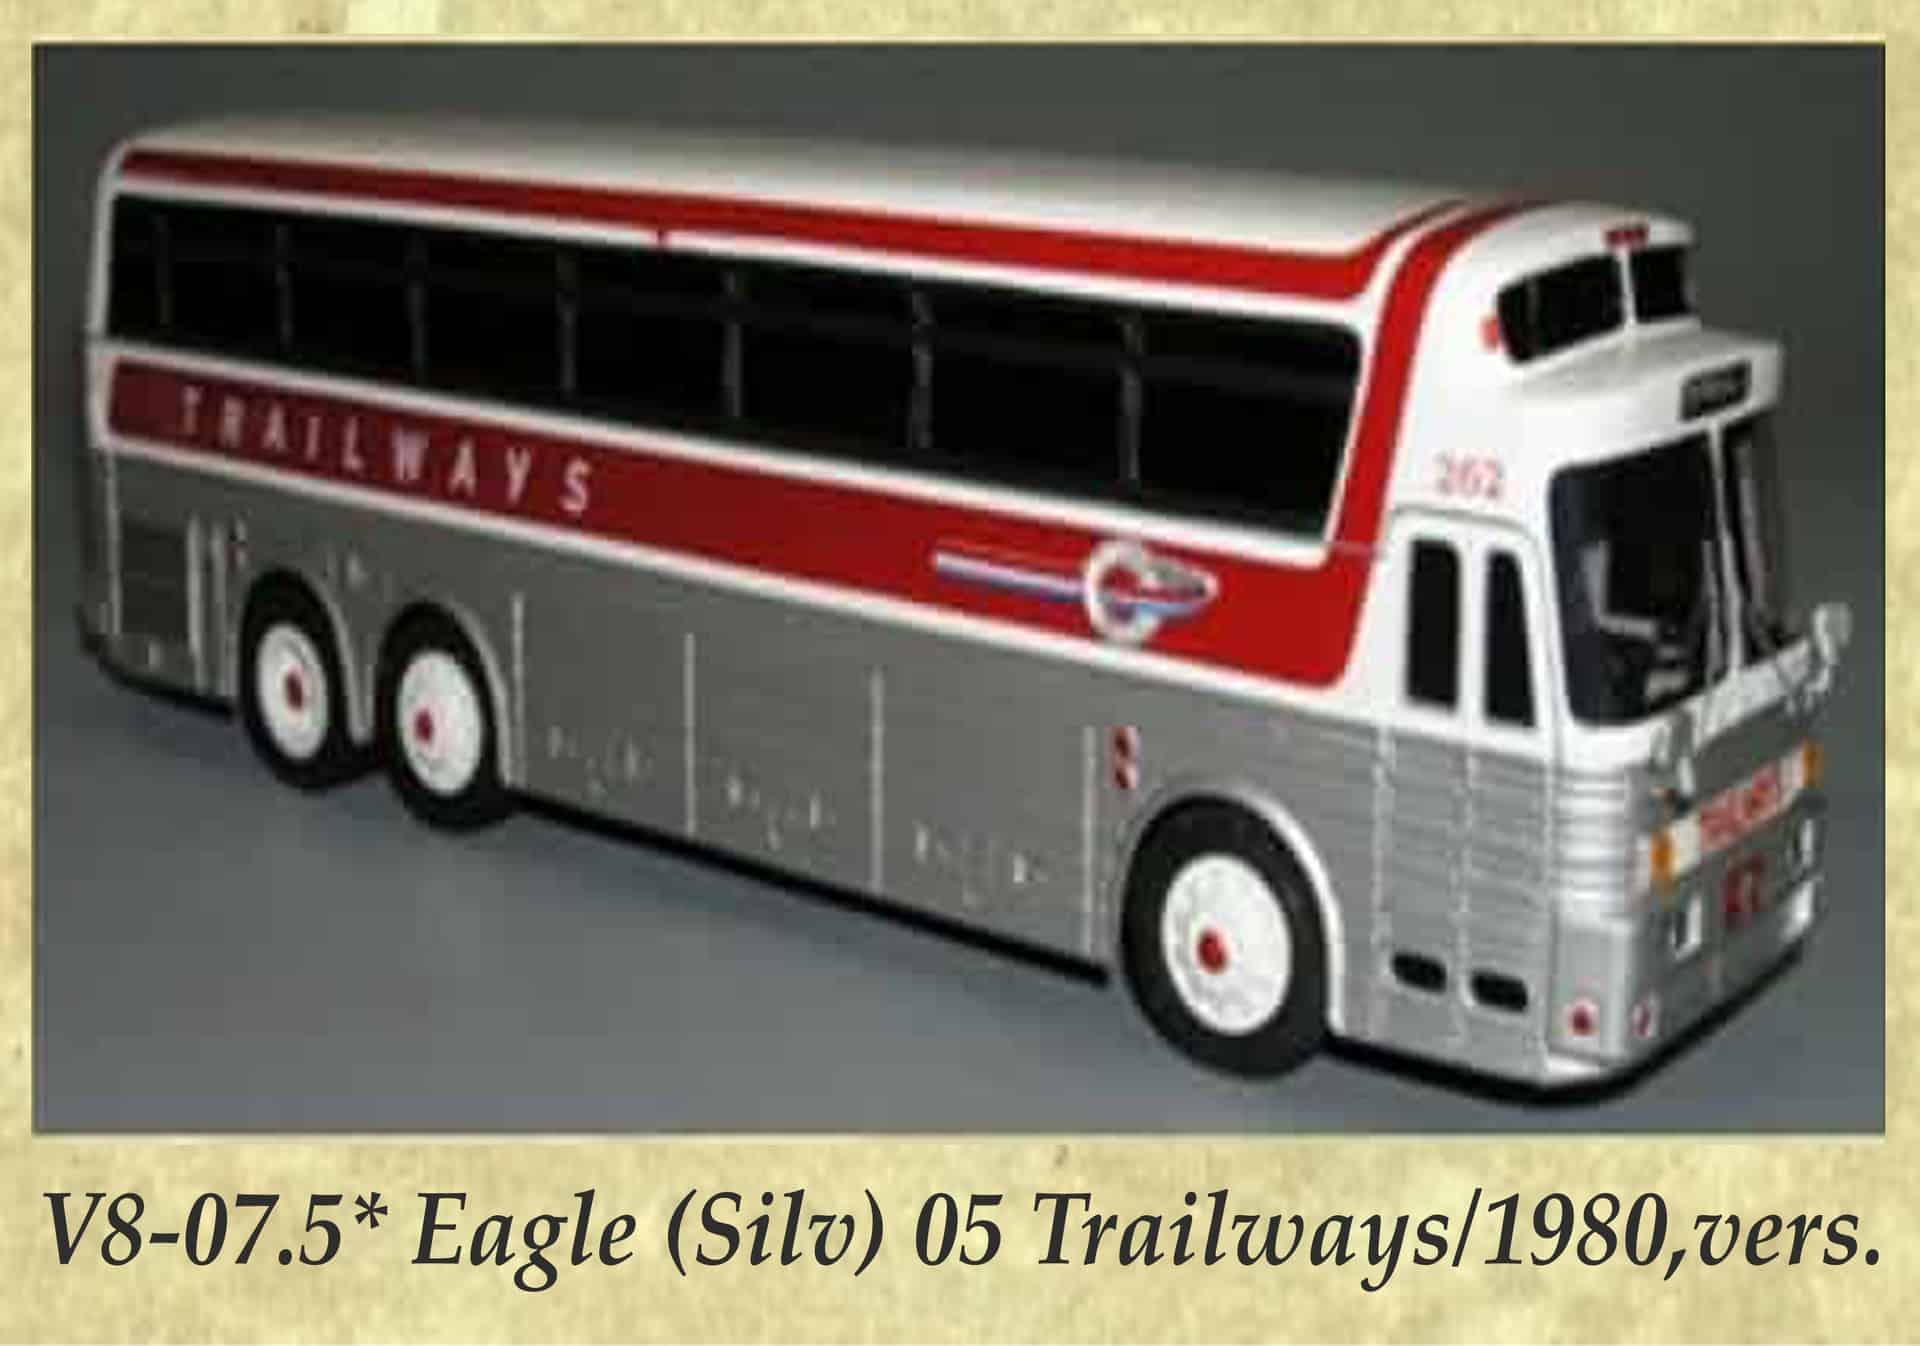 V8-07.5 Eagle (Silv) 05 Trailways 1980,vers.